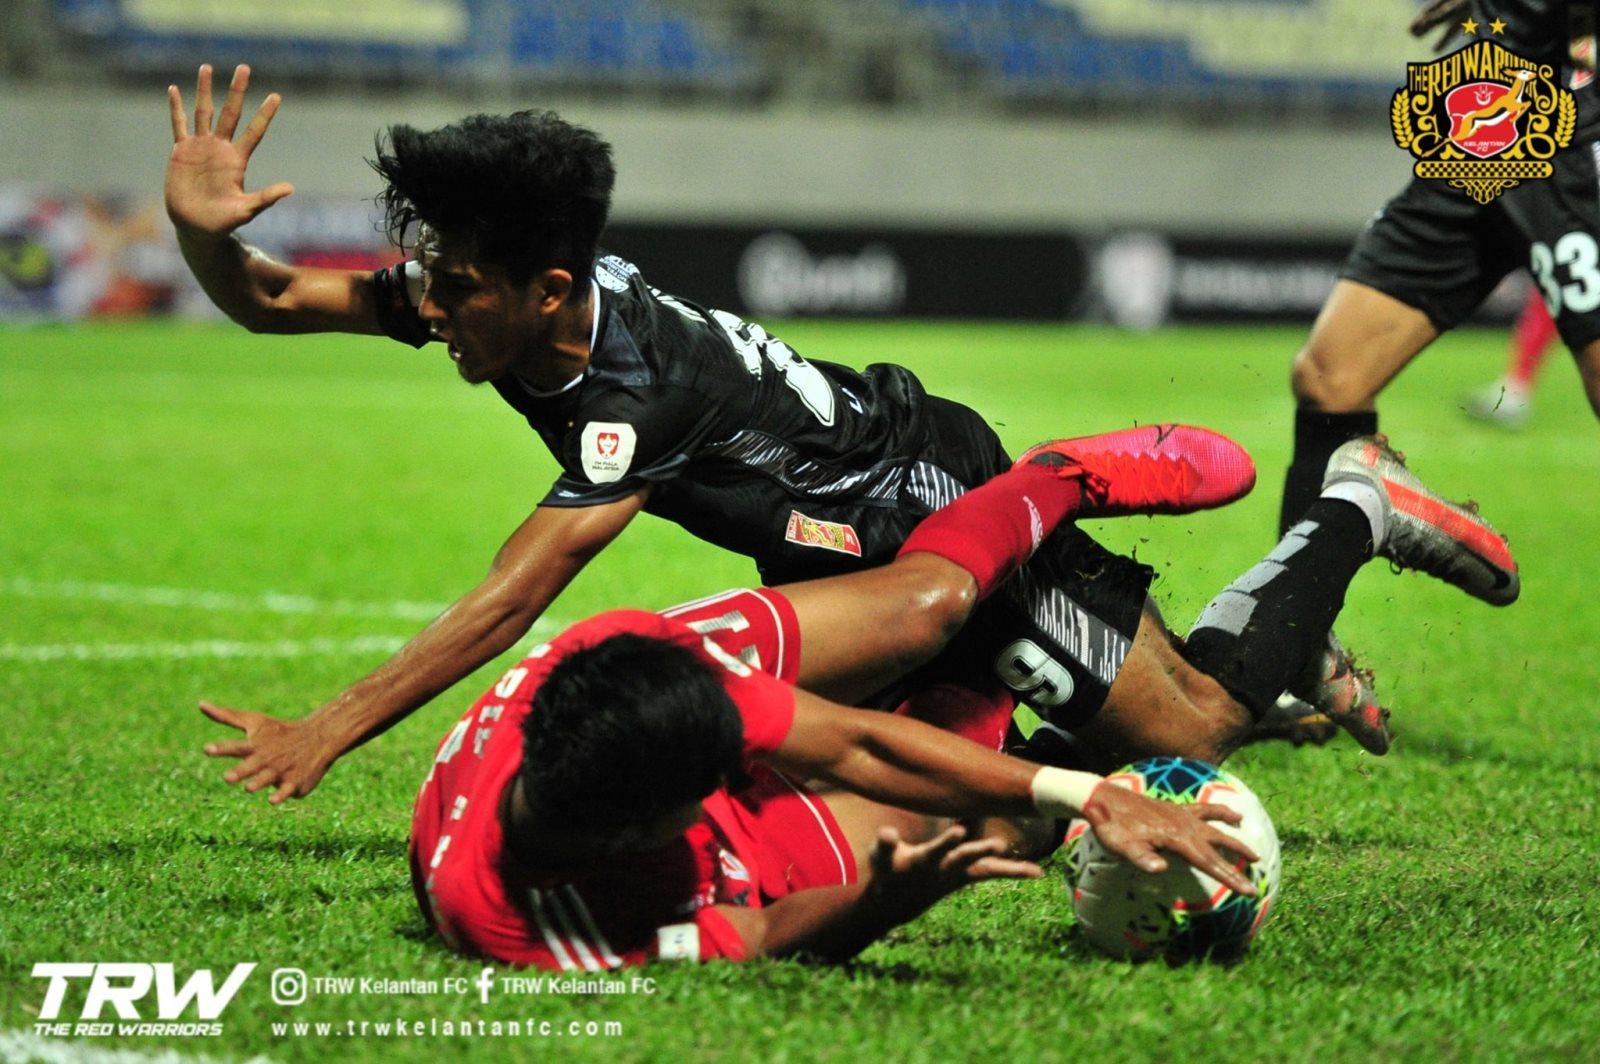 Kelantan UITM FC Piala Malaysia 2020 Frank Bernhardt